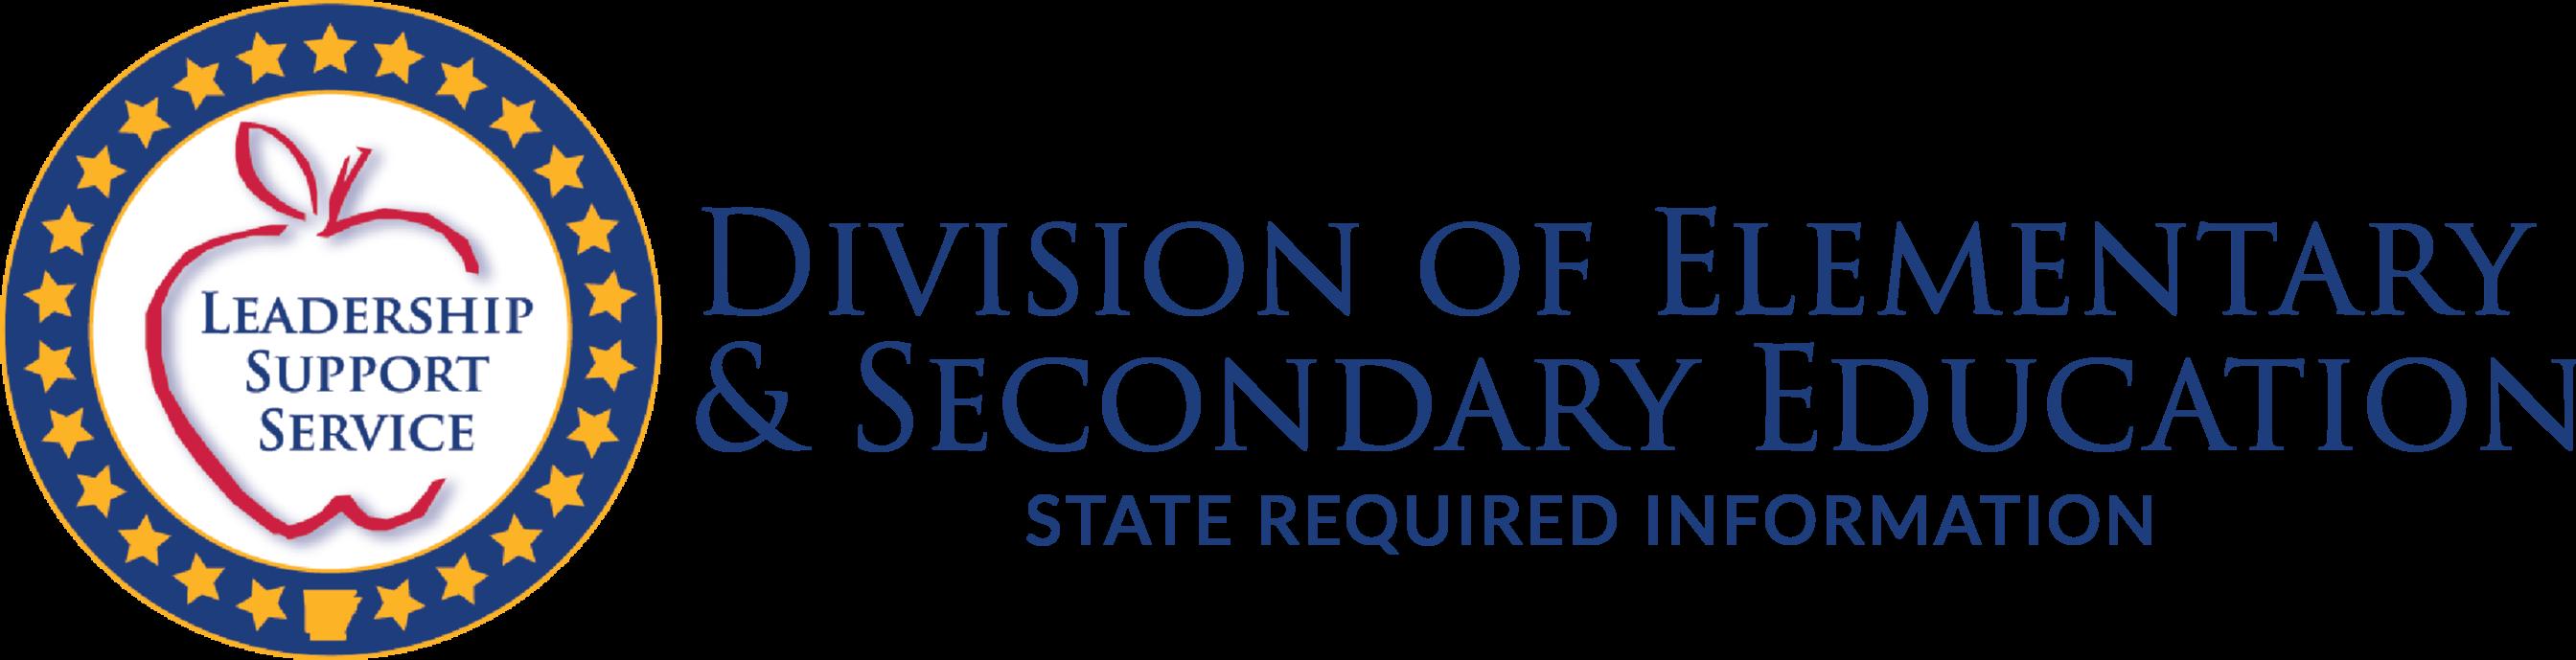 Arkansas DESE State Required Information